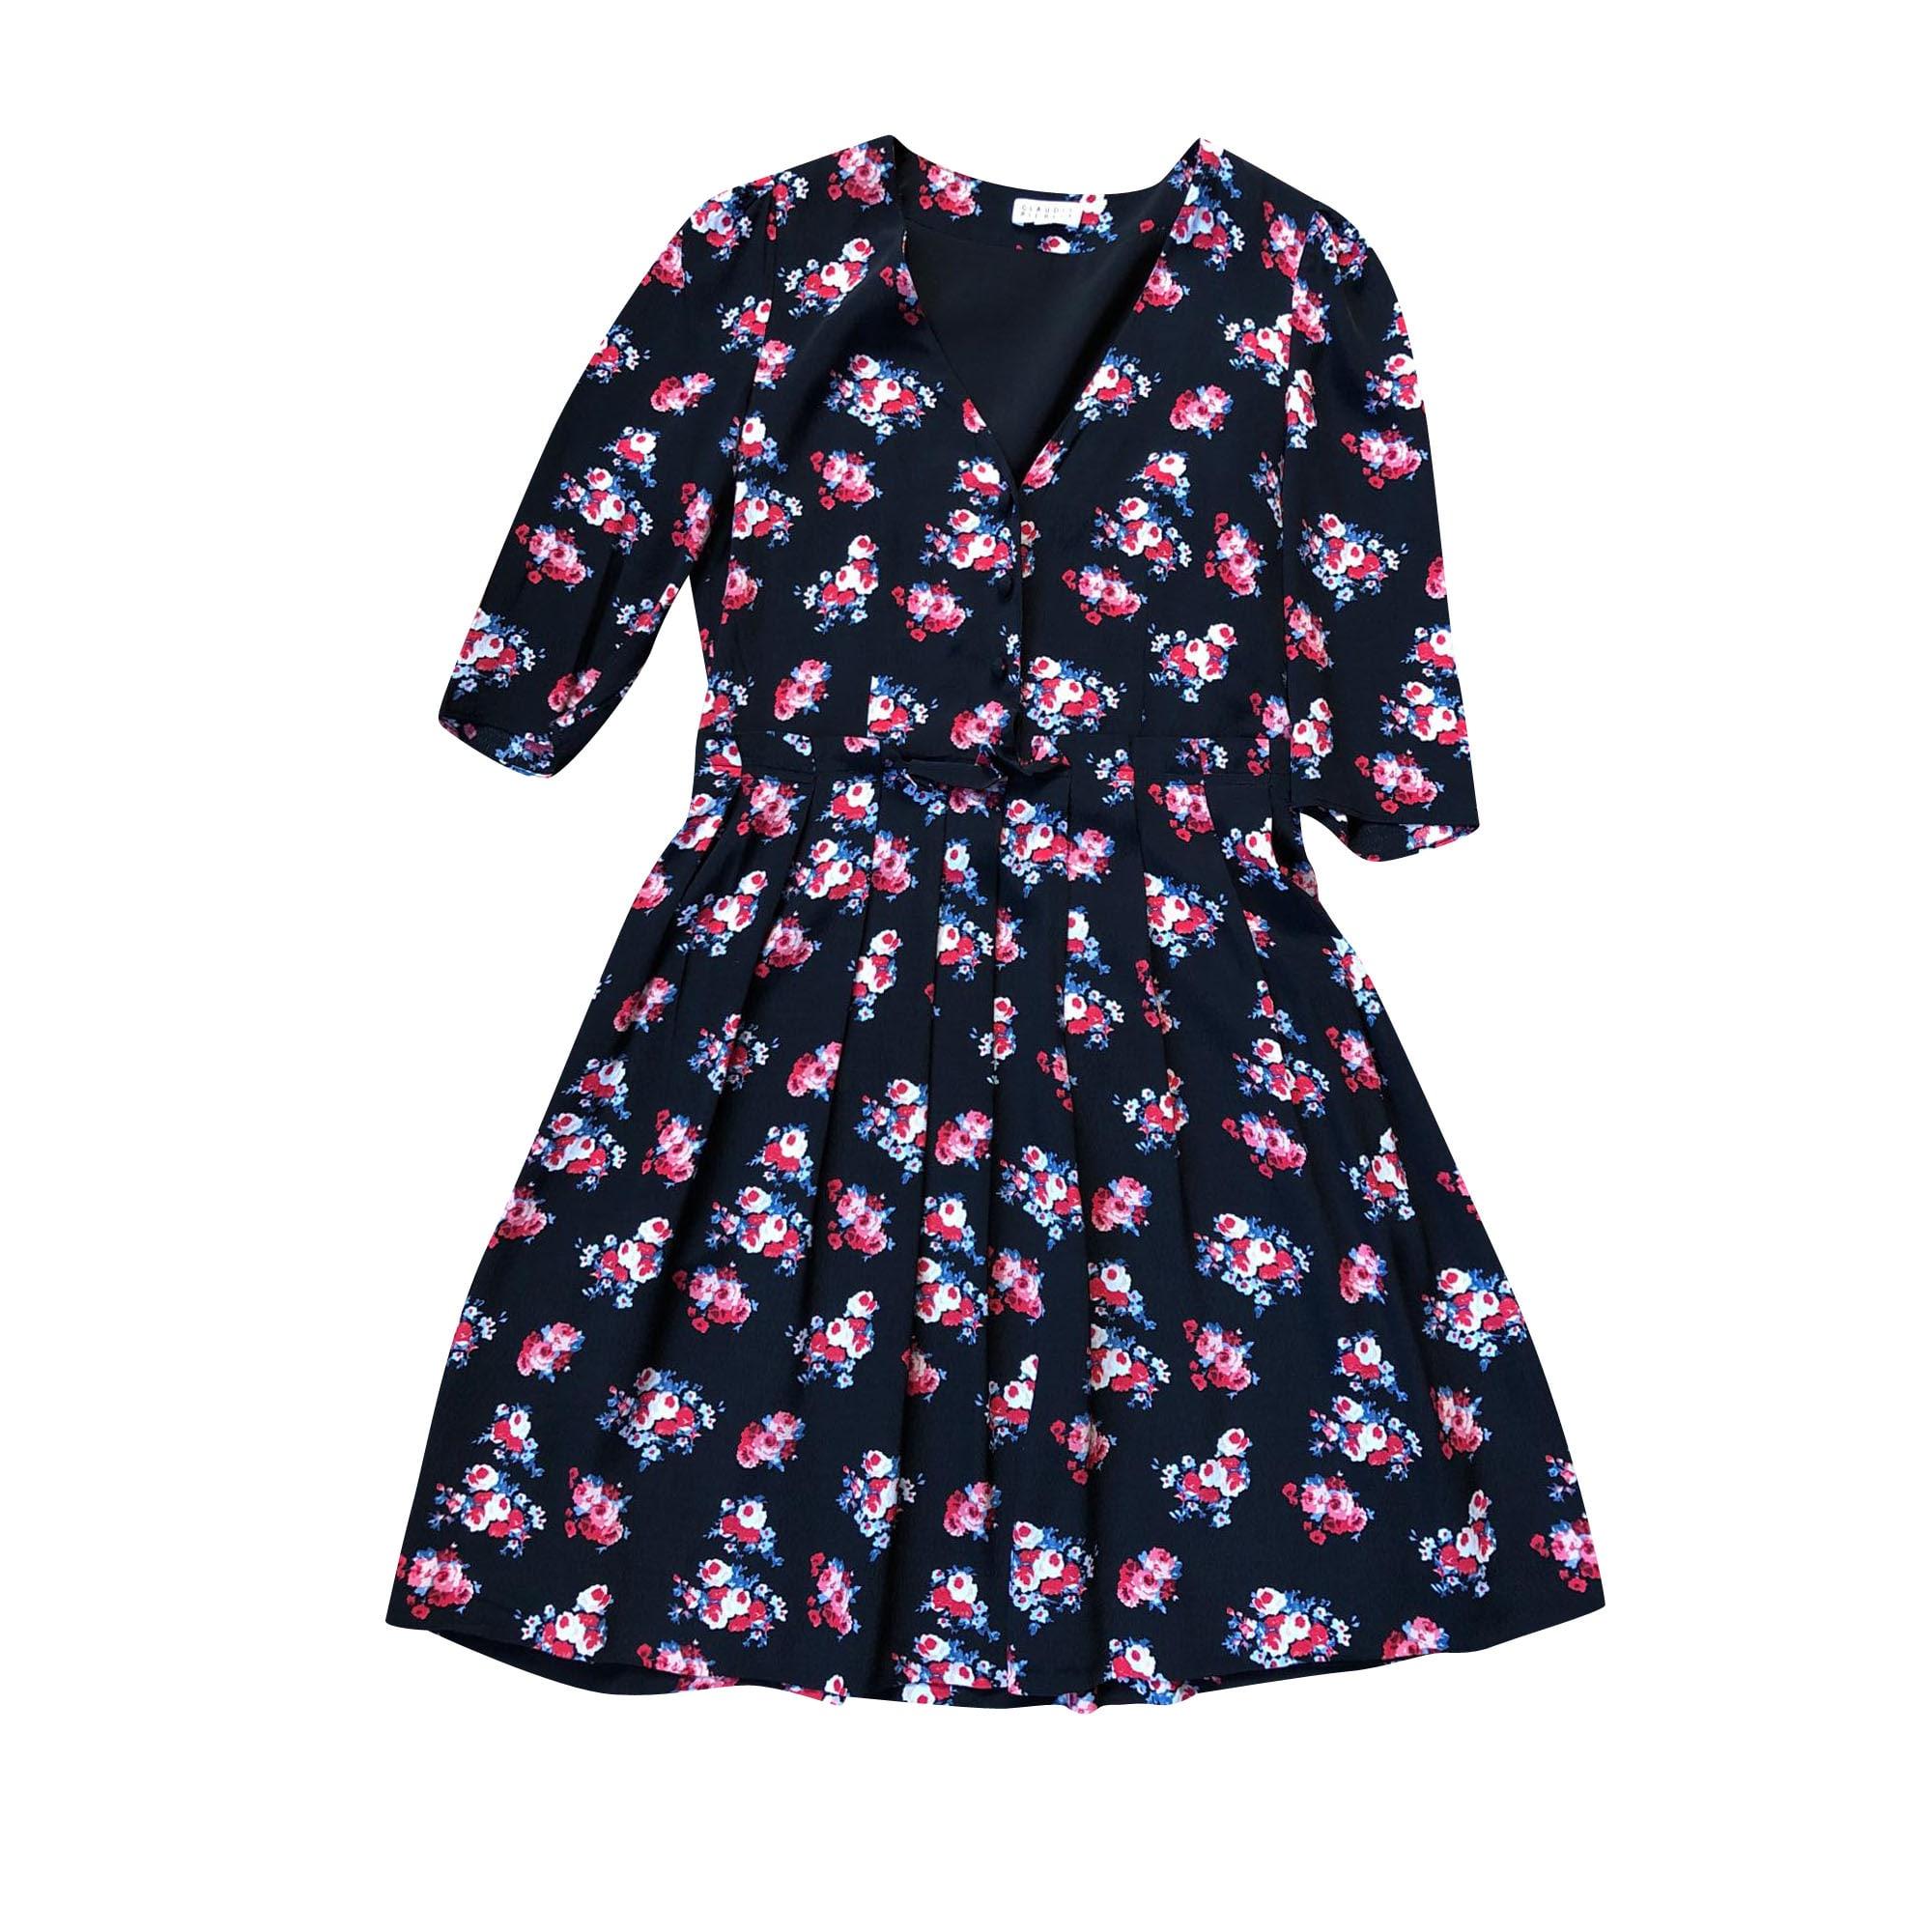 Robe courte CLAUDIE PIERLOT Noir motif fleuri